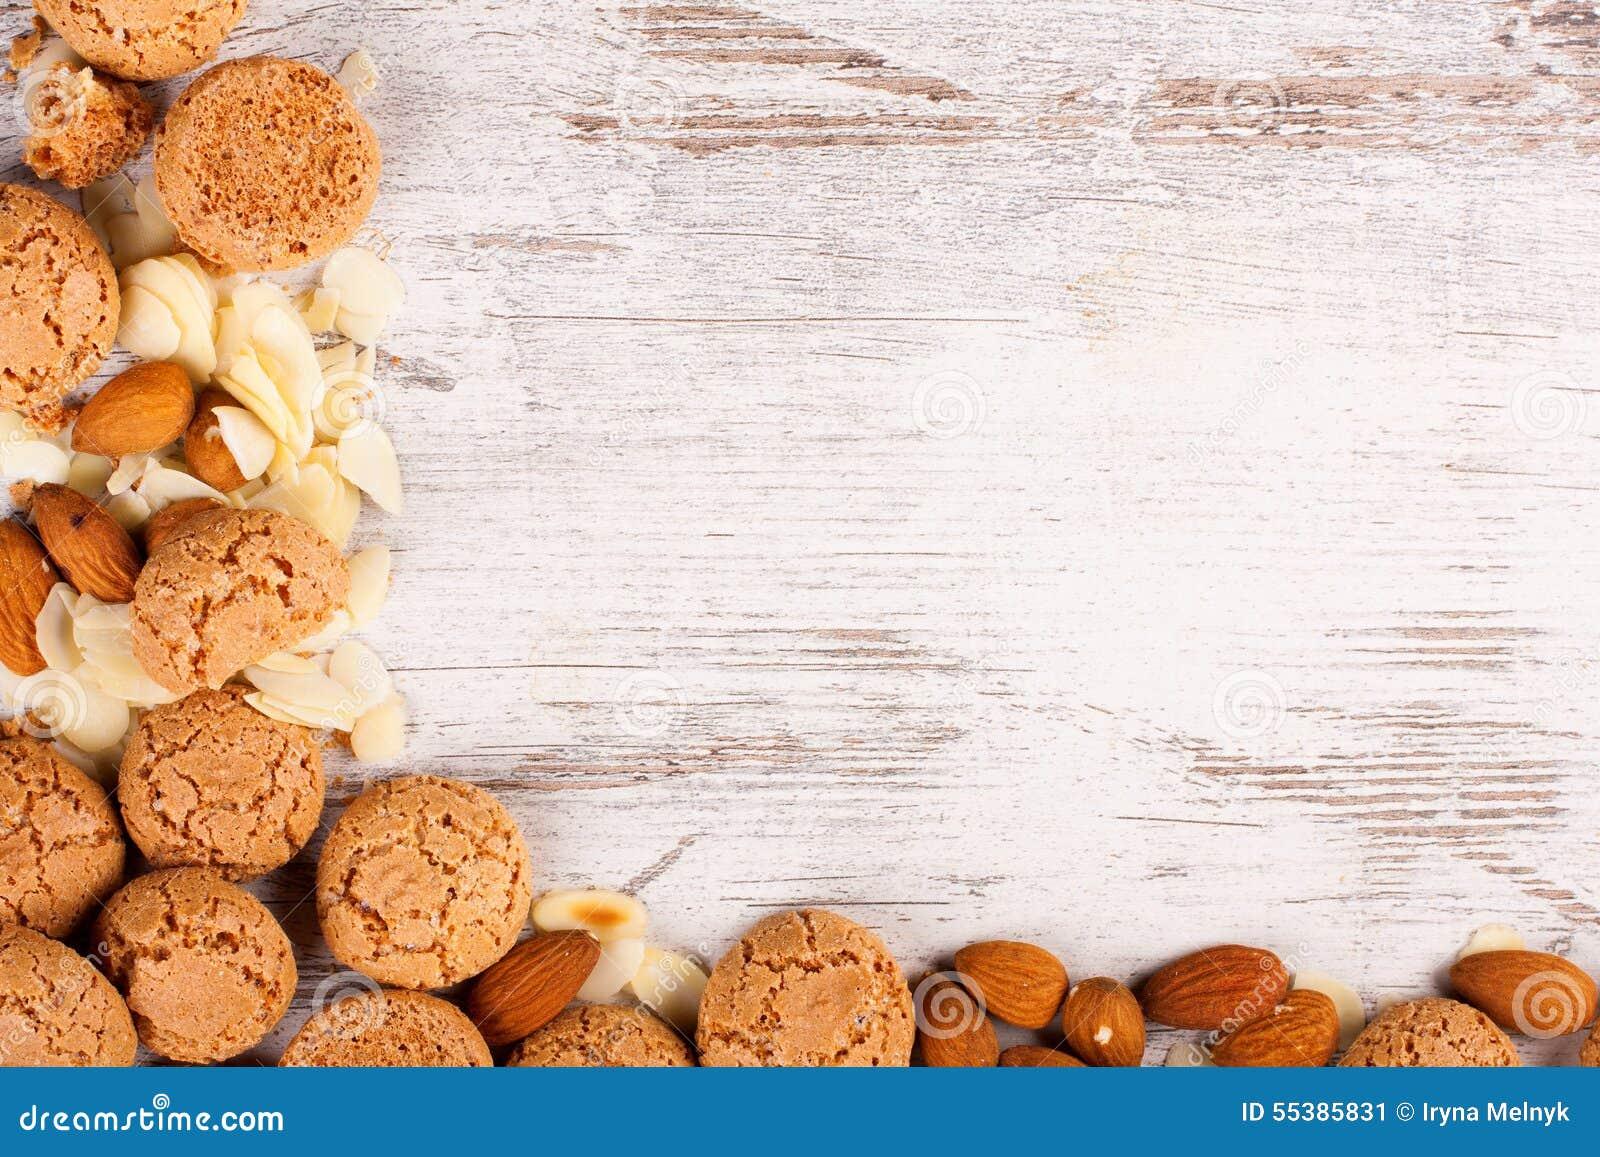 White Chocolate Almonds Cookies